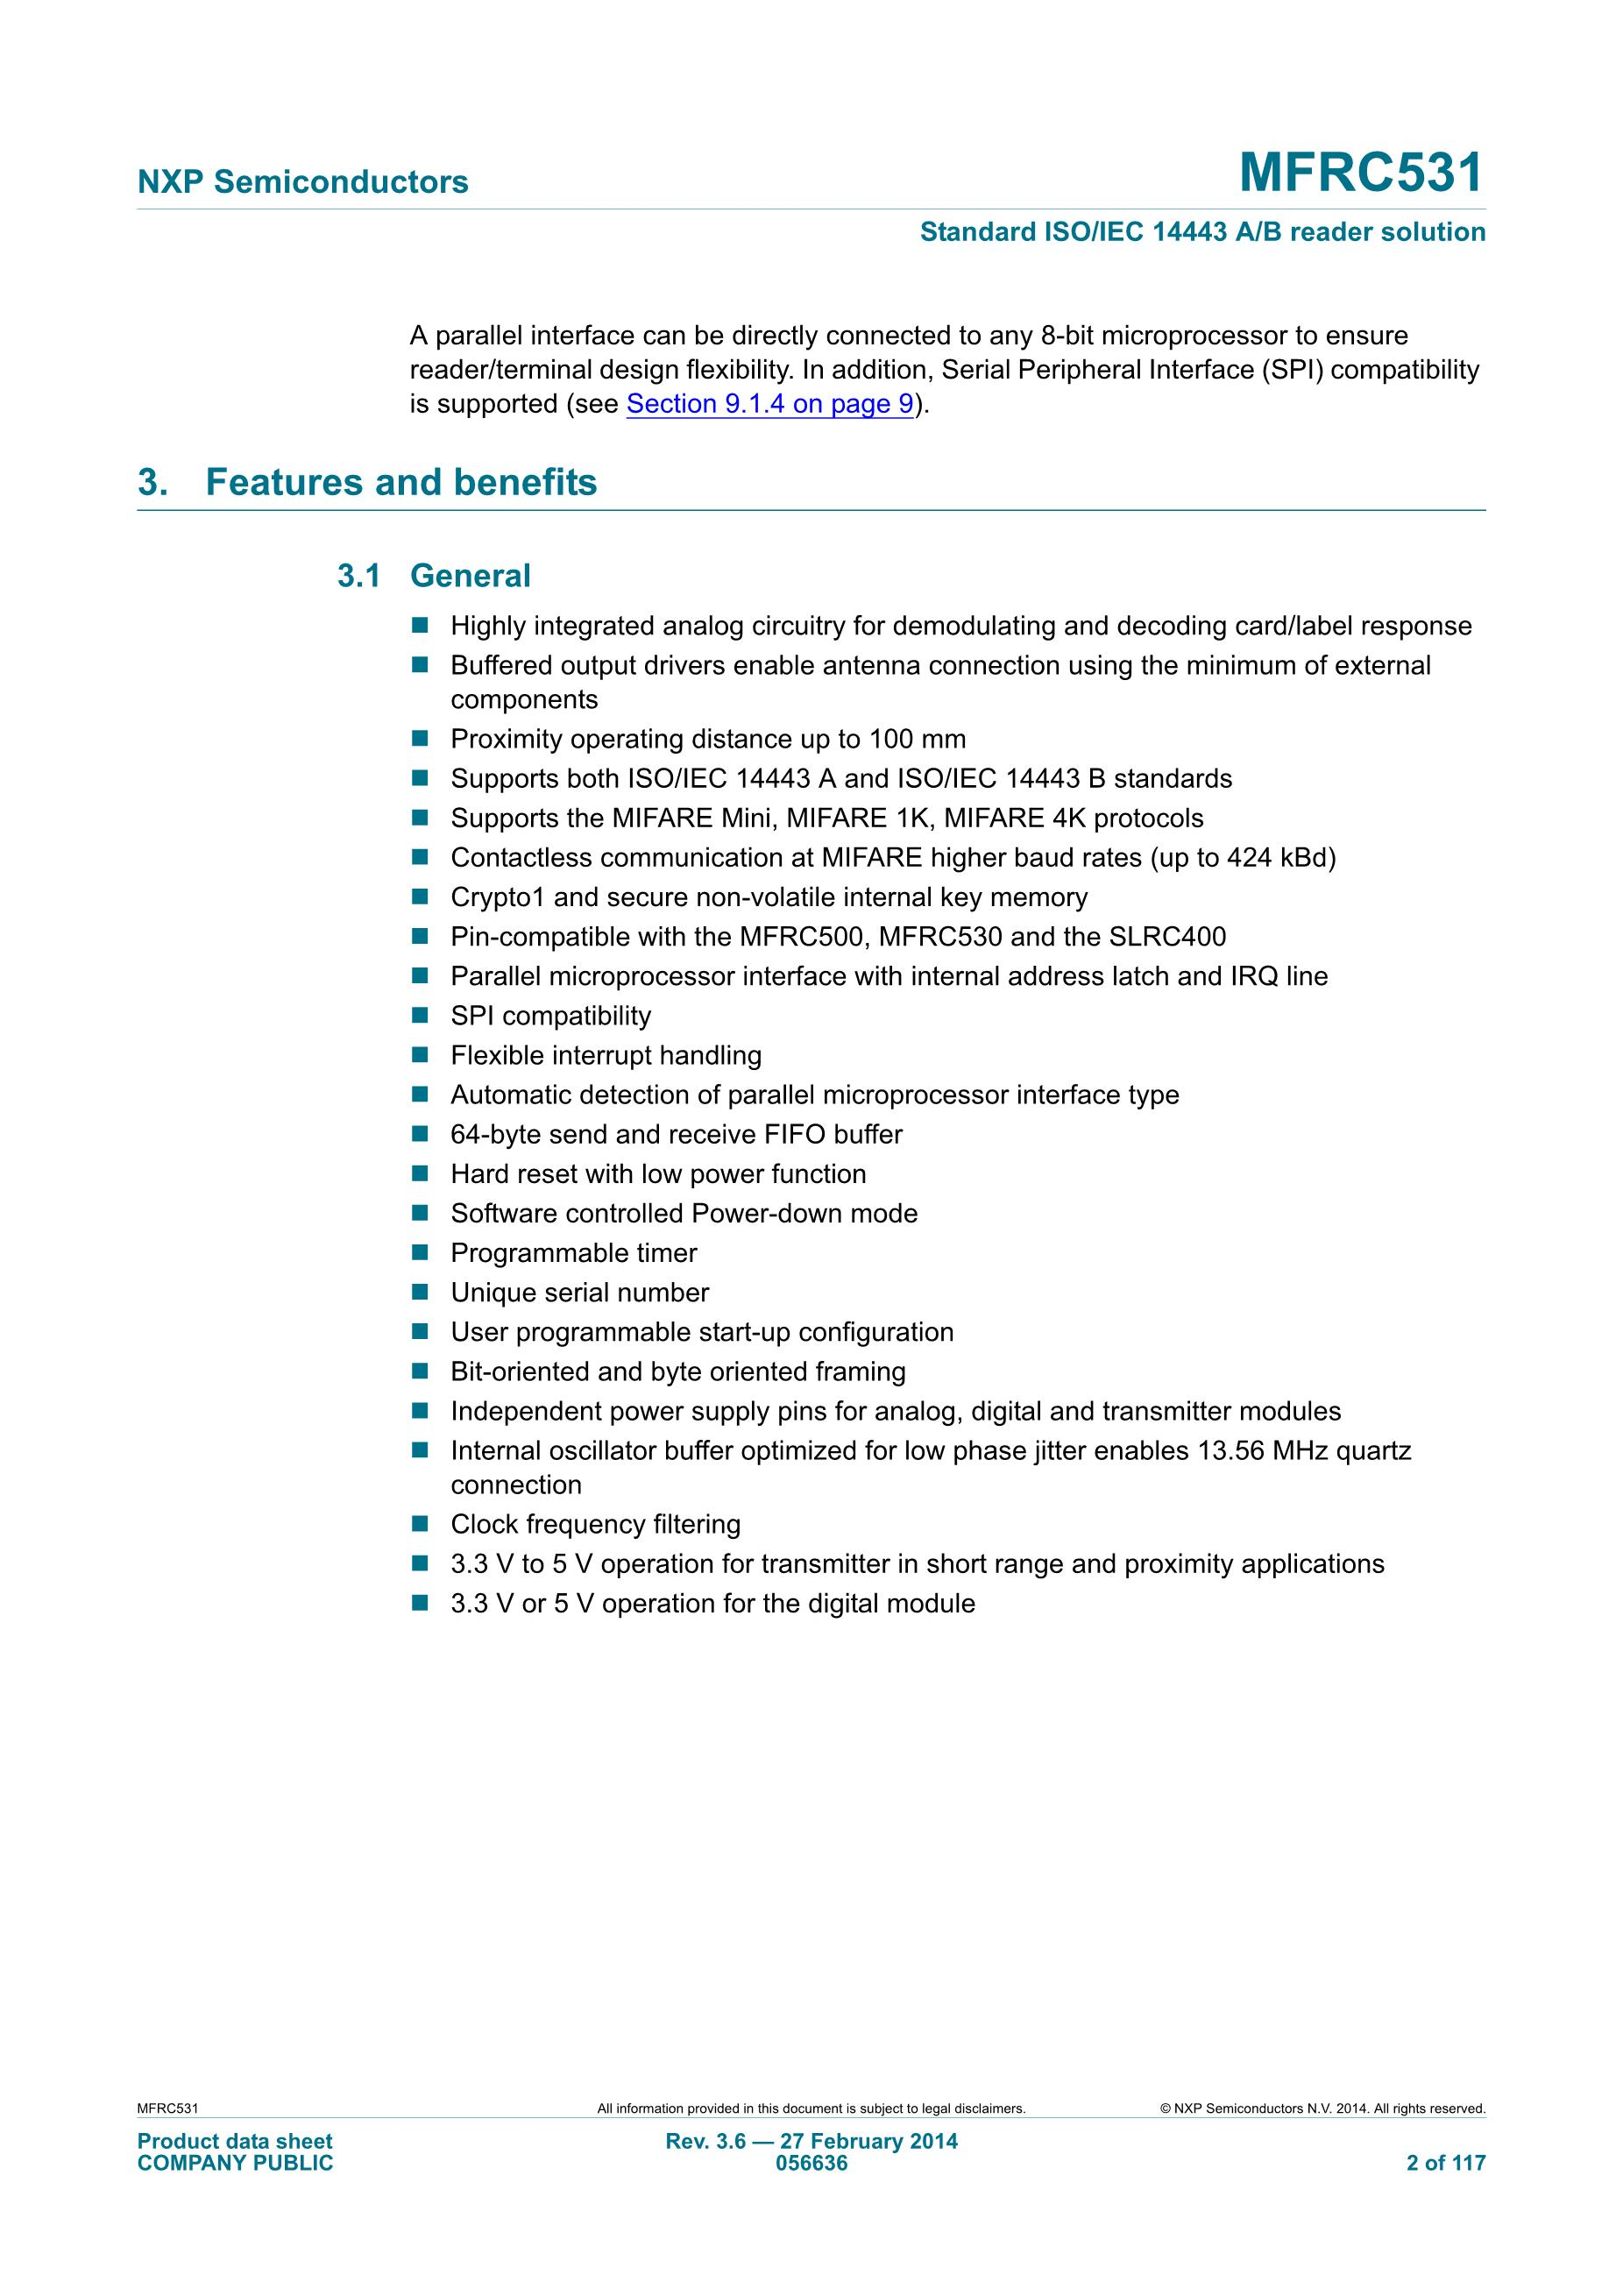 MFRC-522 RC522 RFID RF IC card induction module sent S50 Fudan card, key link's pdf picture 2